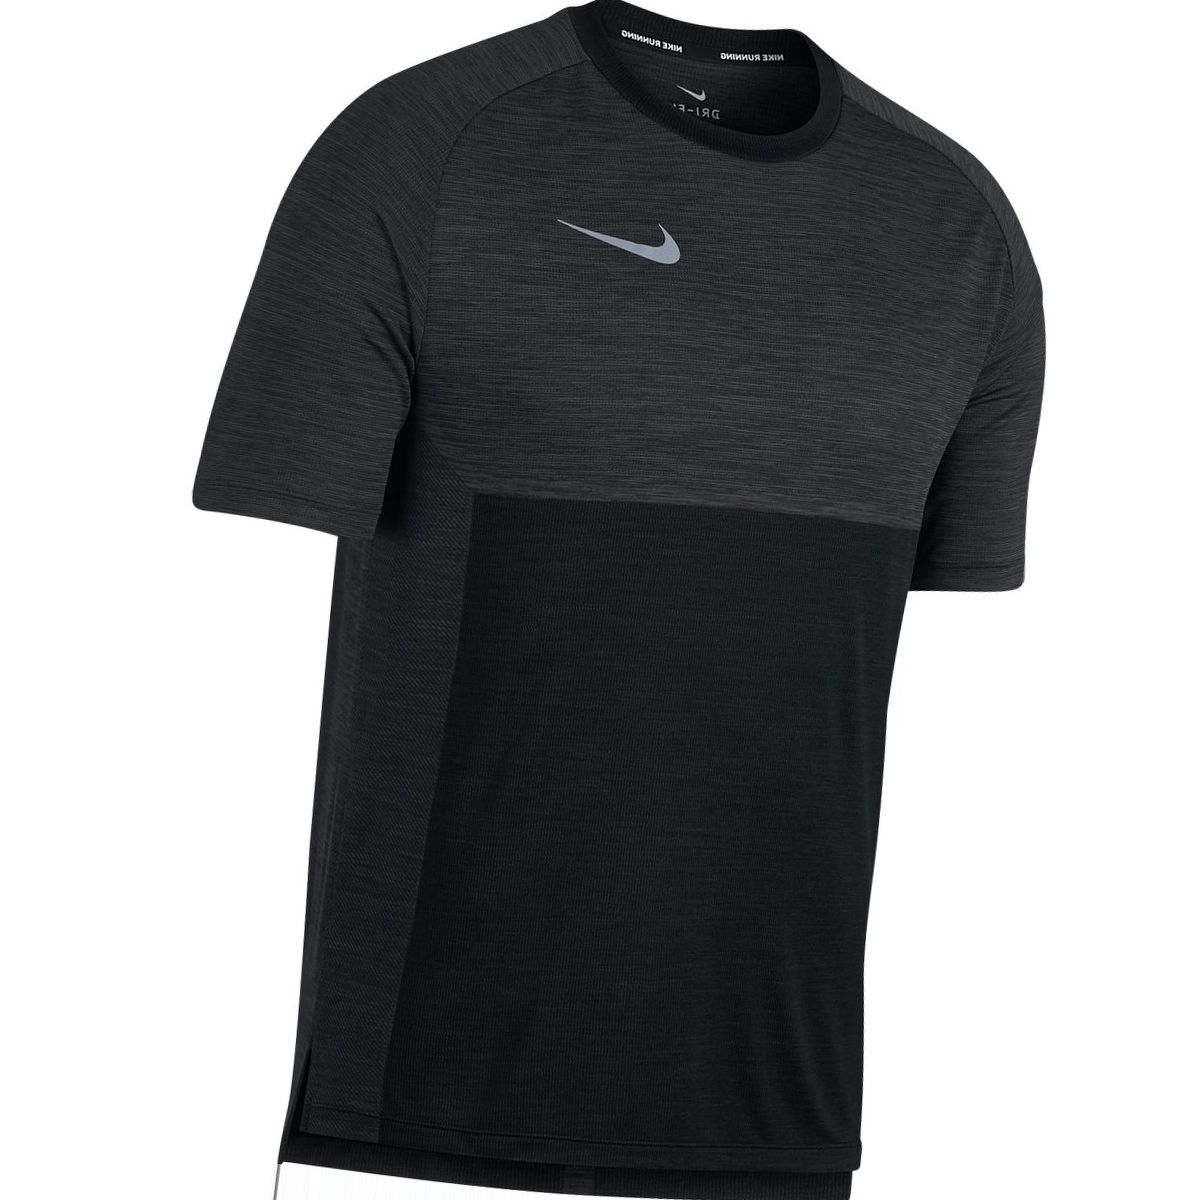 Nike Dri-Fit Medalist Top - Men's